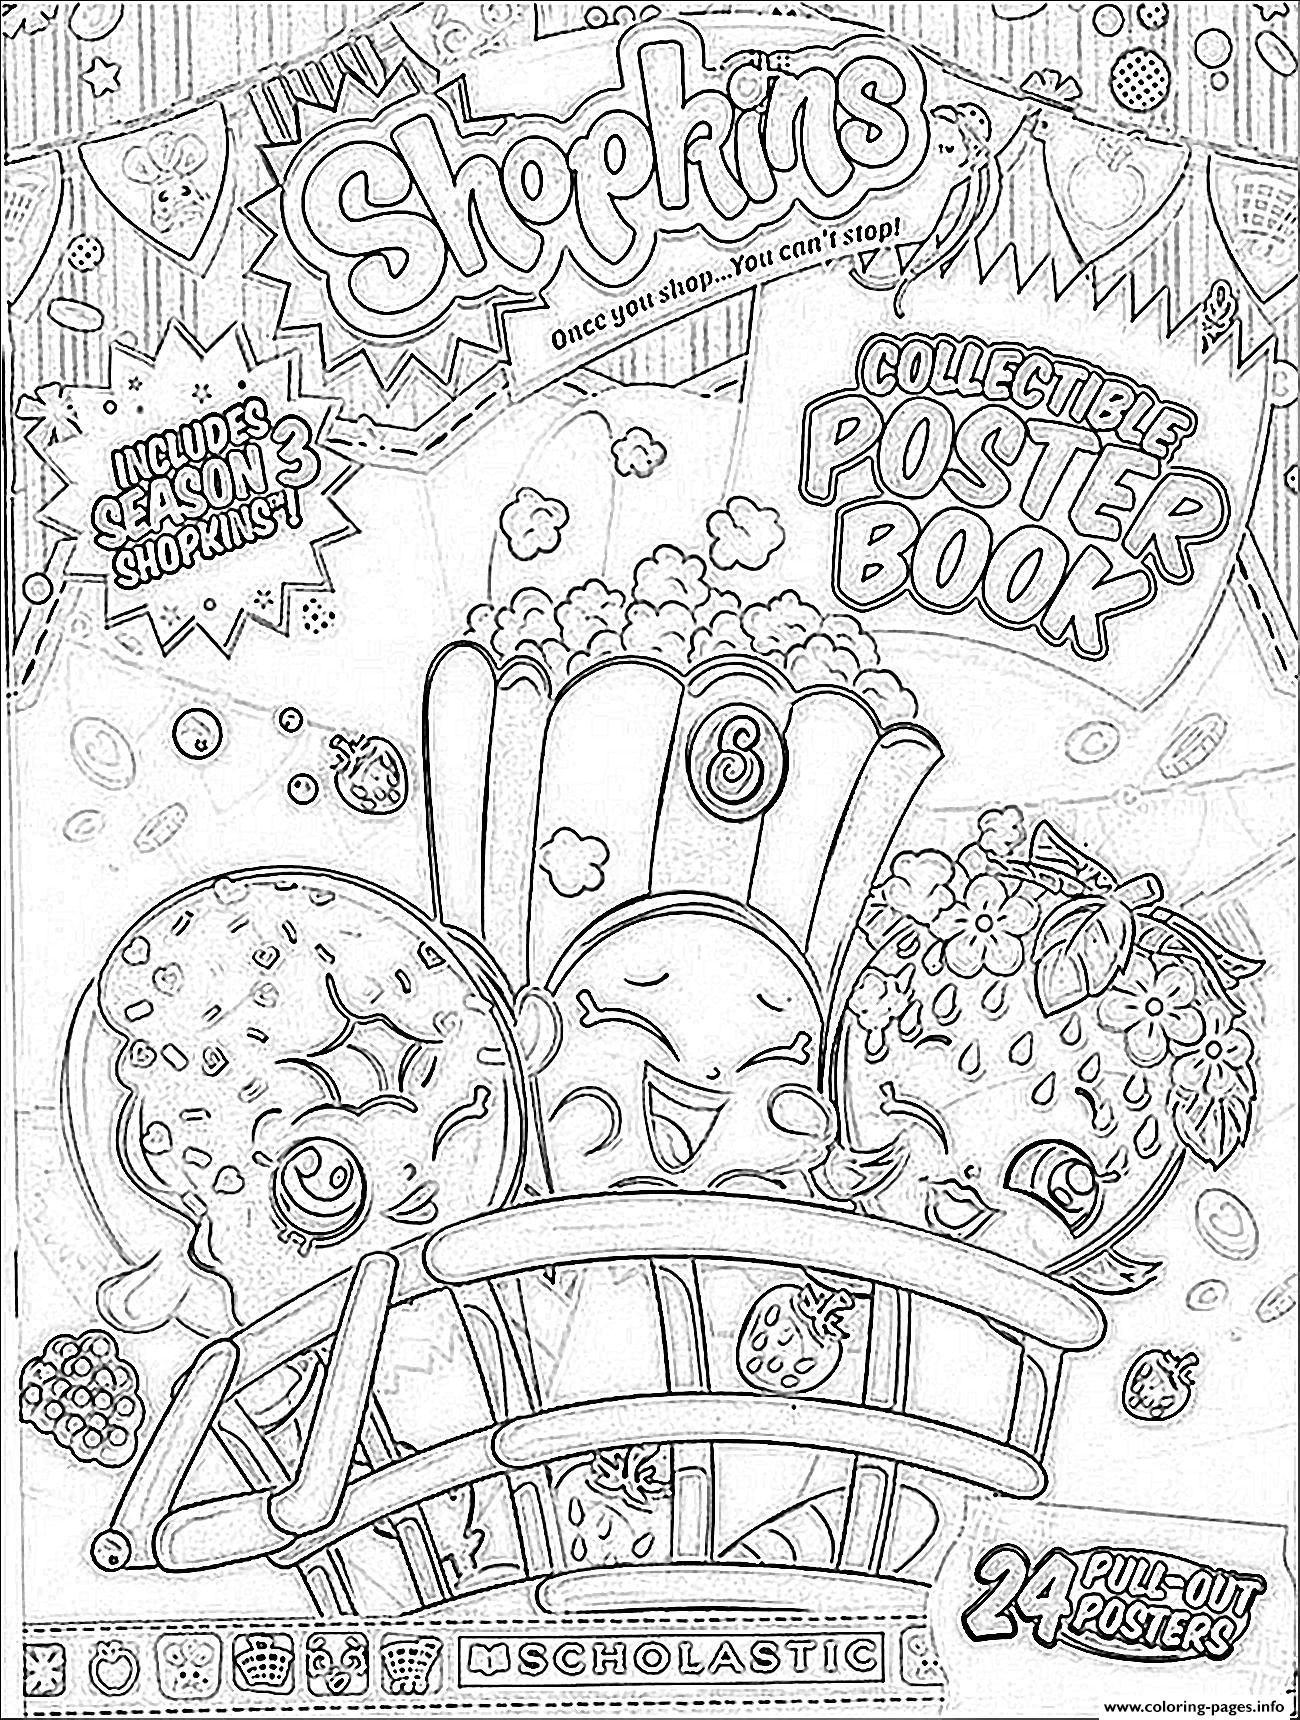 Print Shopkins Season 3 Book Coloring Pages Kids Pinterest